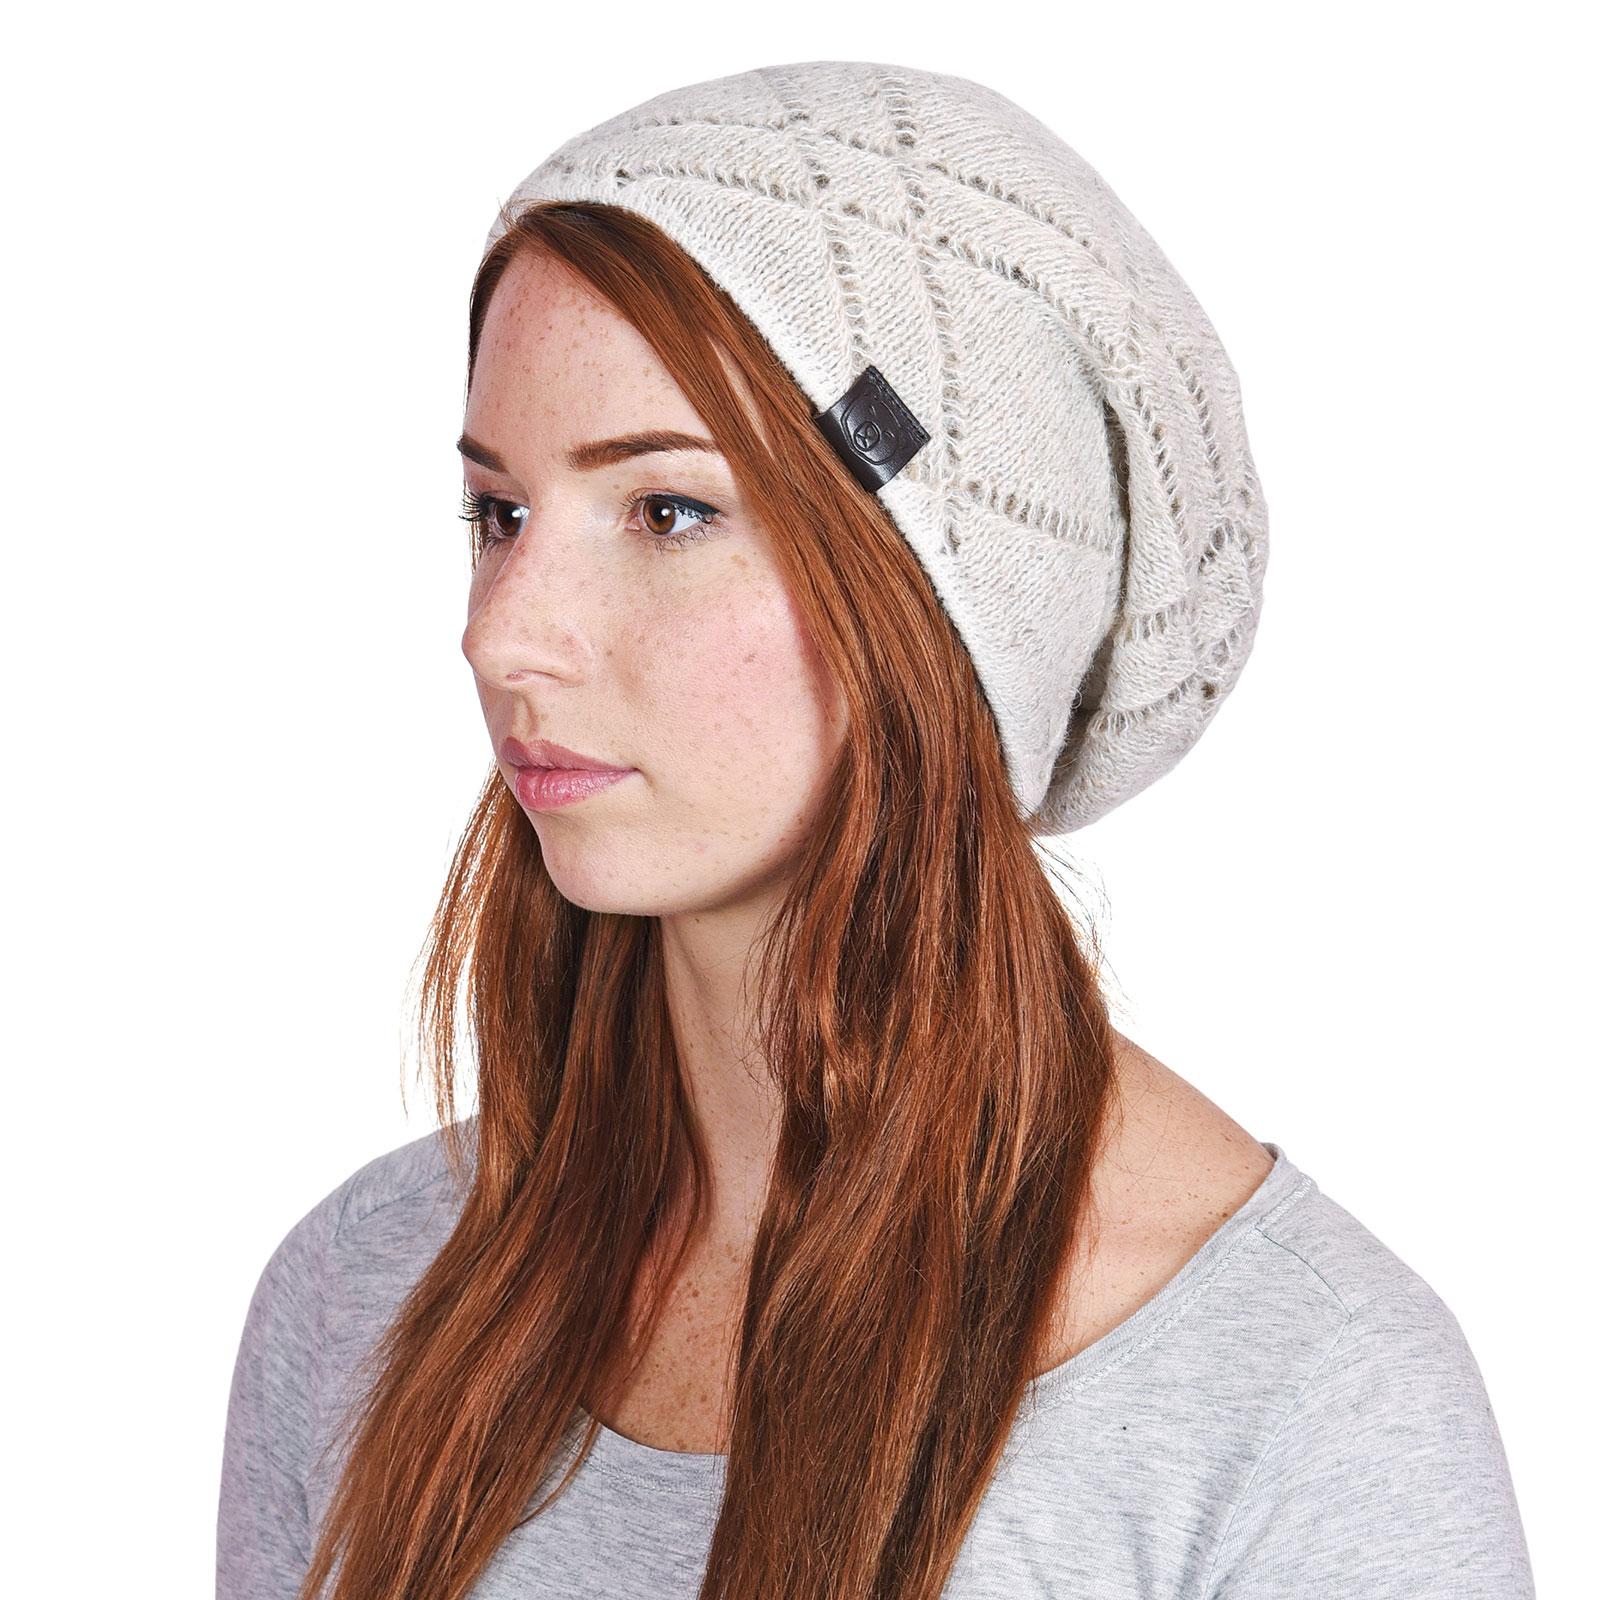 CP-01058-VF16-P-bonnet-femme-fantaisie-beige